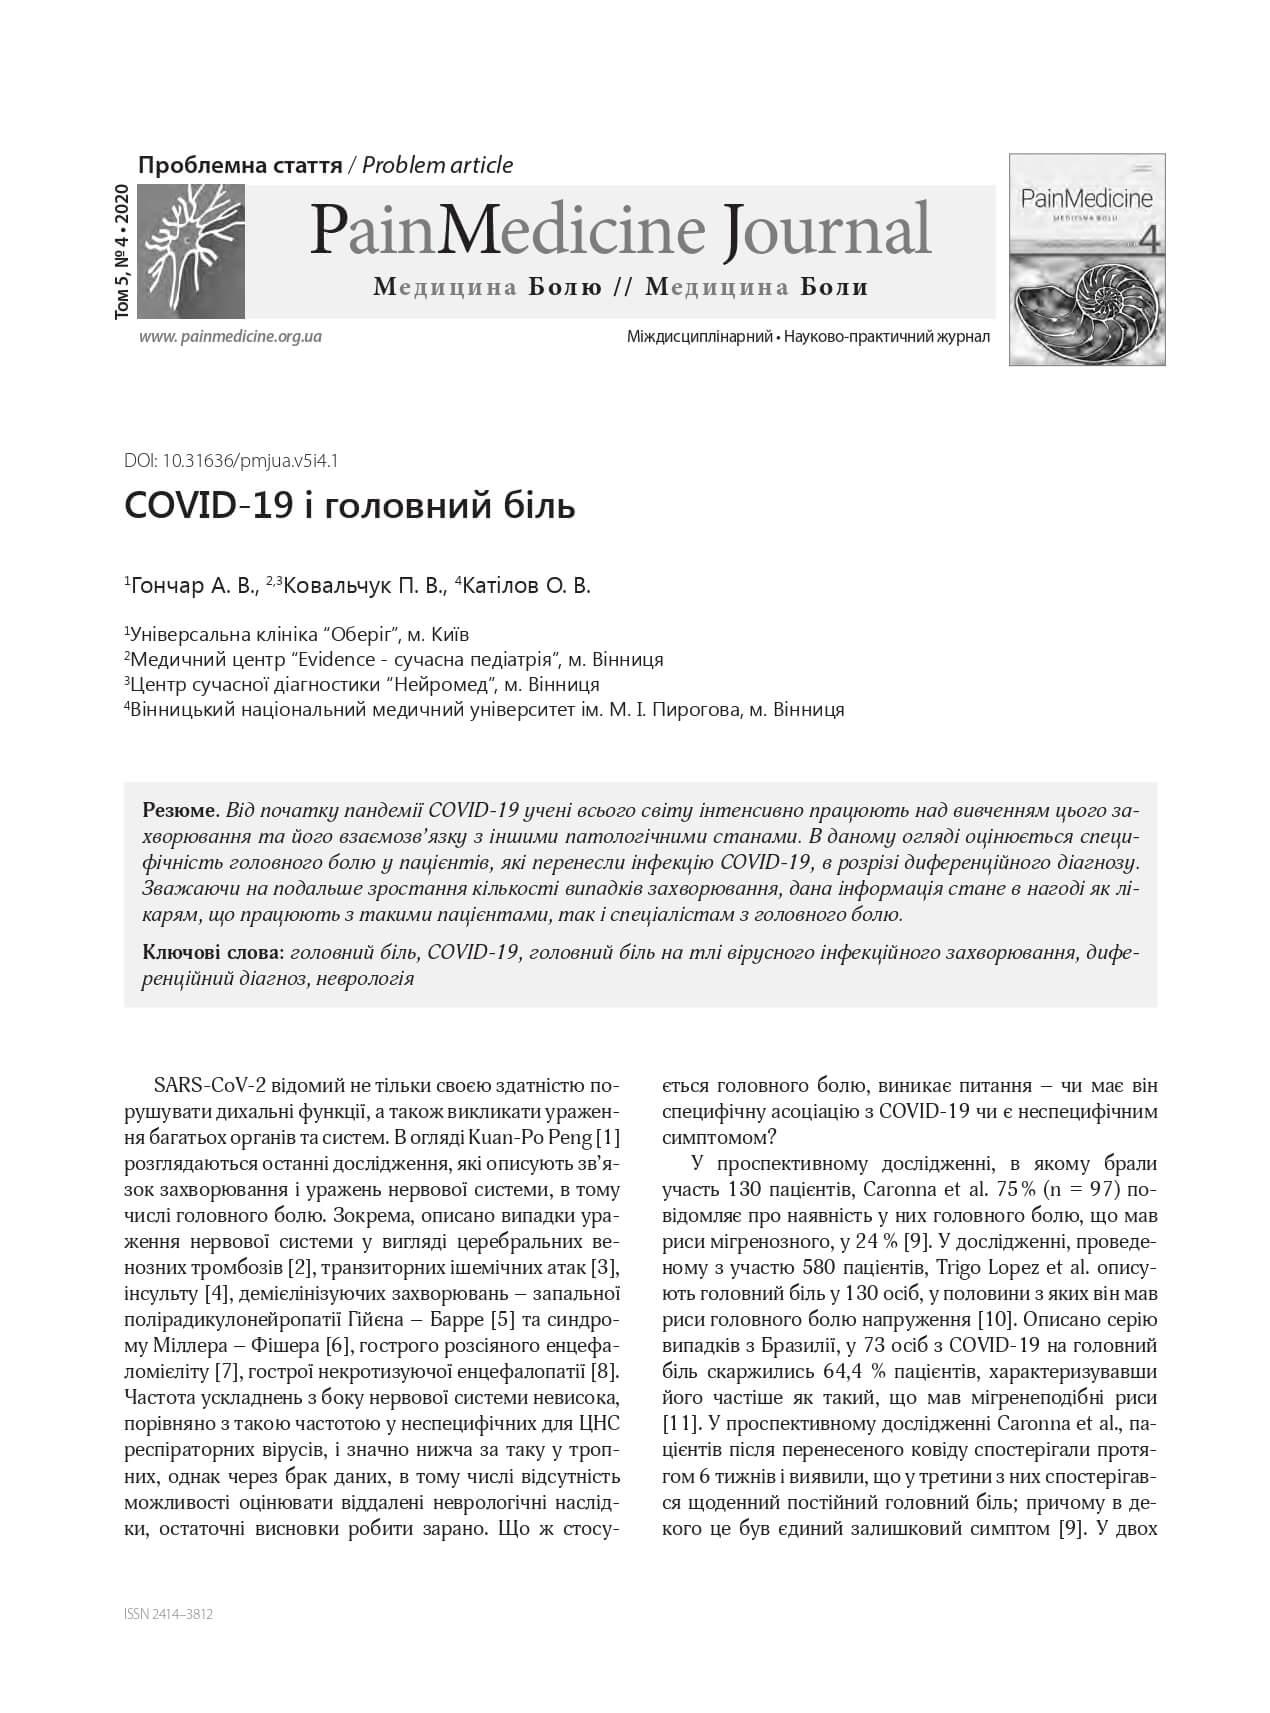 Журнал Pain Medicine 2020 року